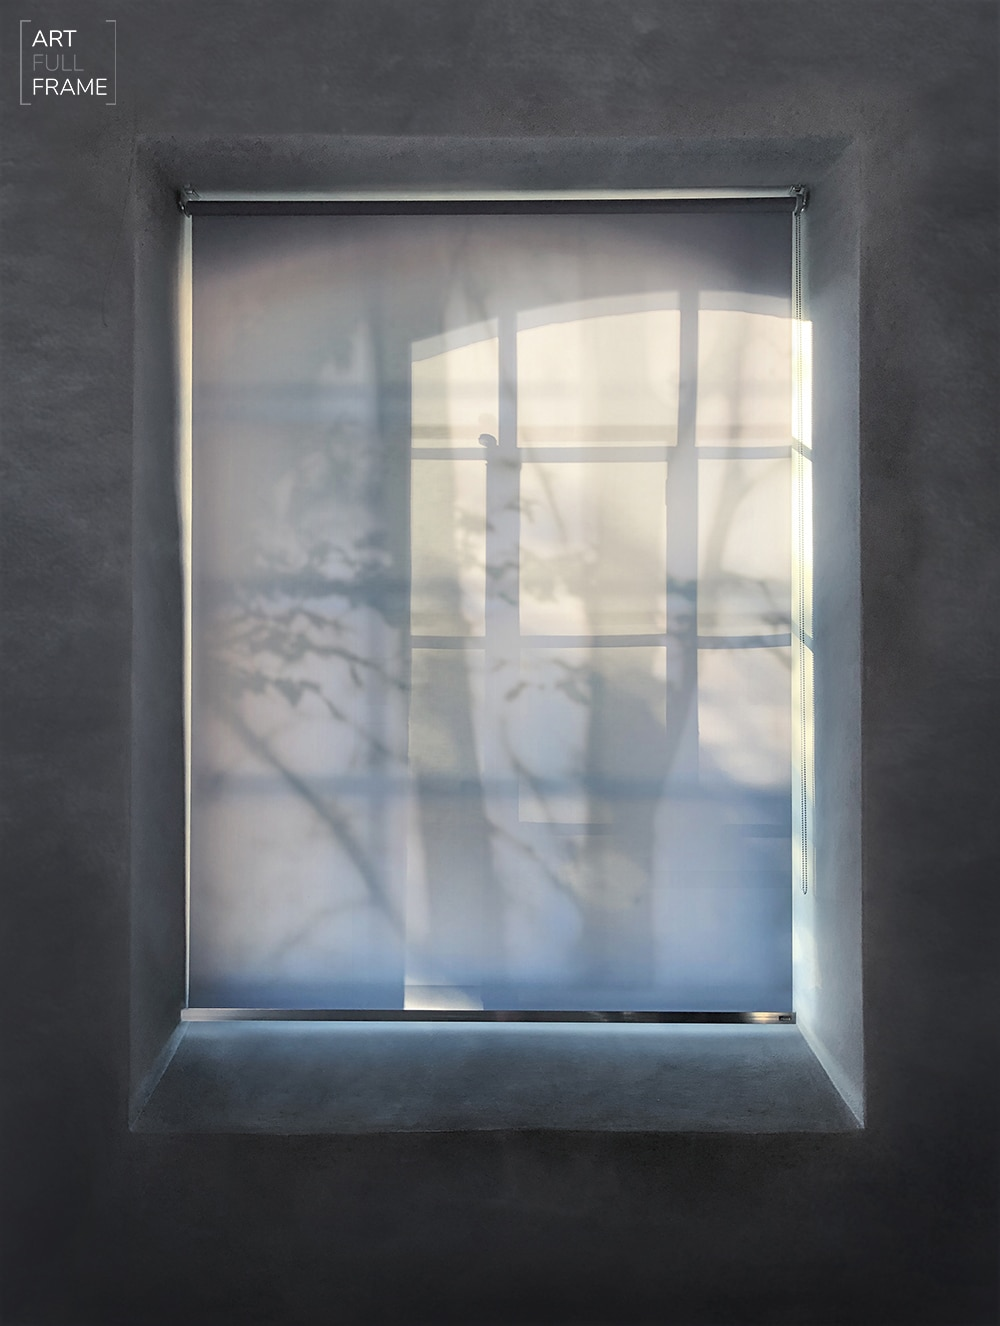 Lock Art 2021 Exhibition - Museo Casa Don Bosco - Turin Italy - ArtFullFrame - artfullframe.com